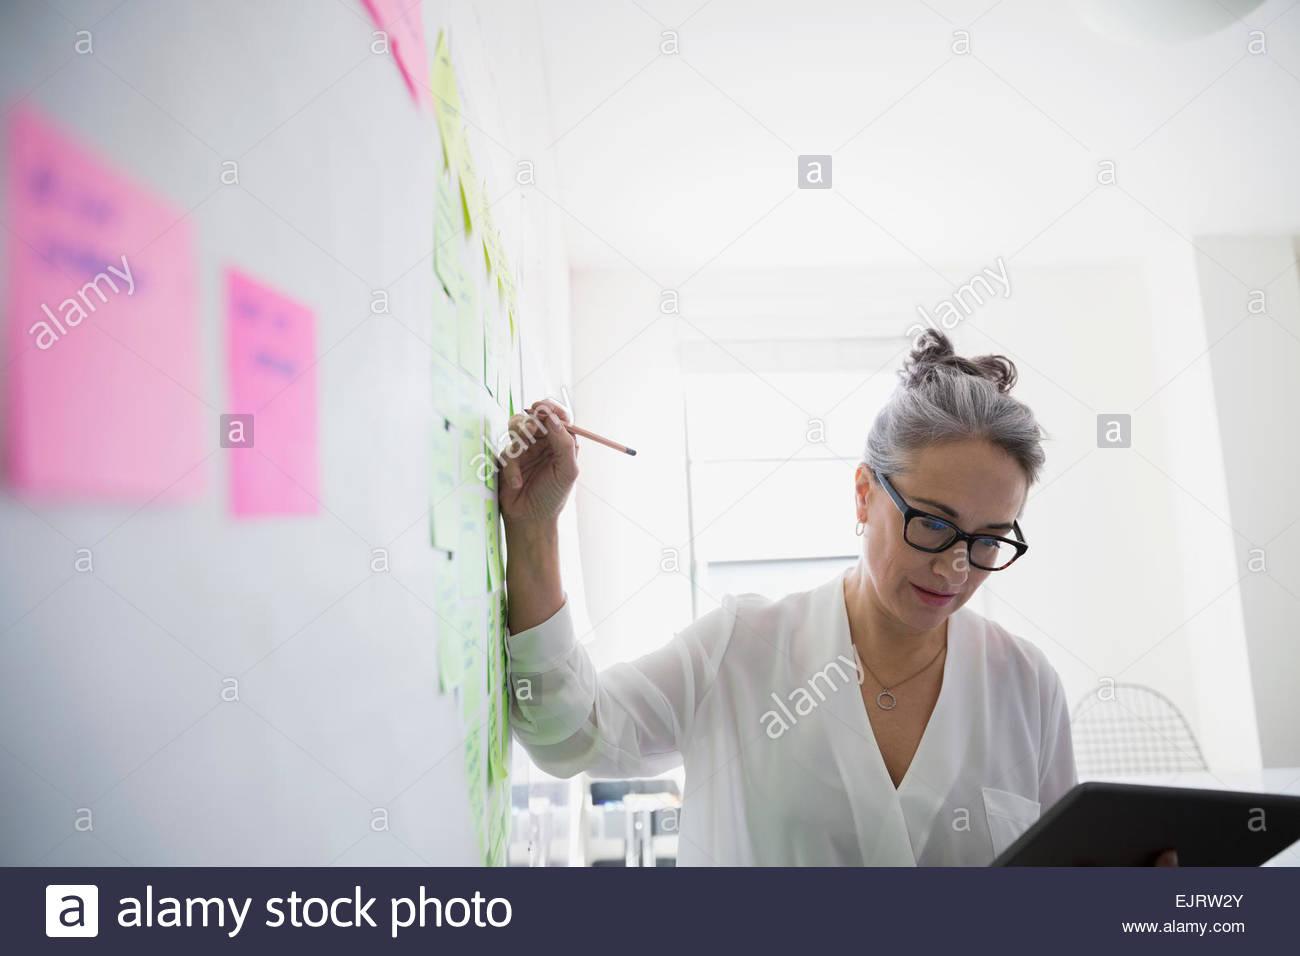 Imprenditrice con tavoletta digitale il brainstorming Immagini Stock